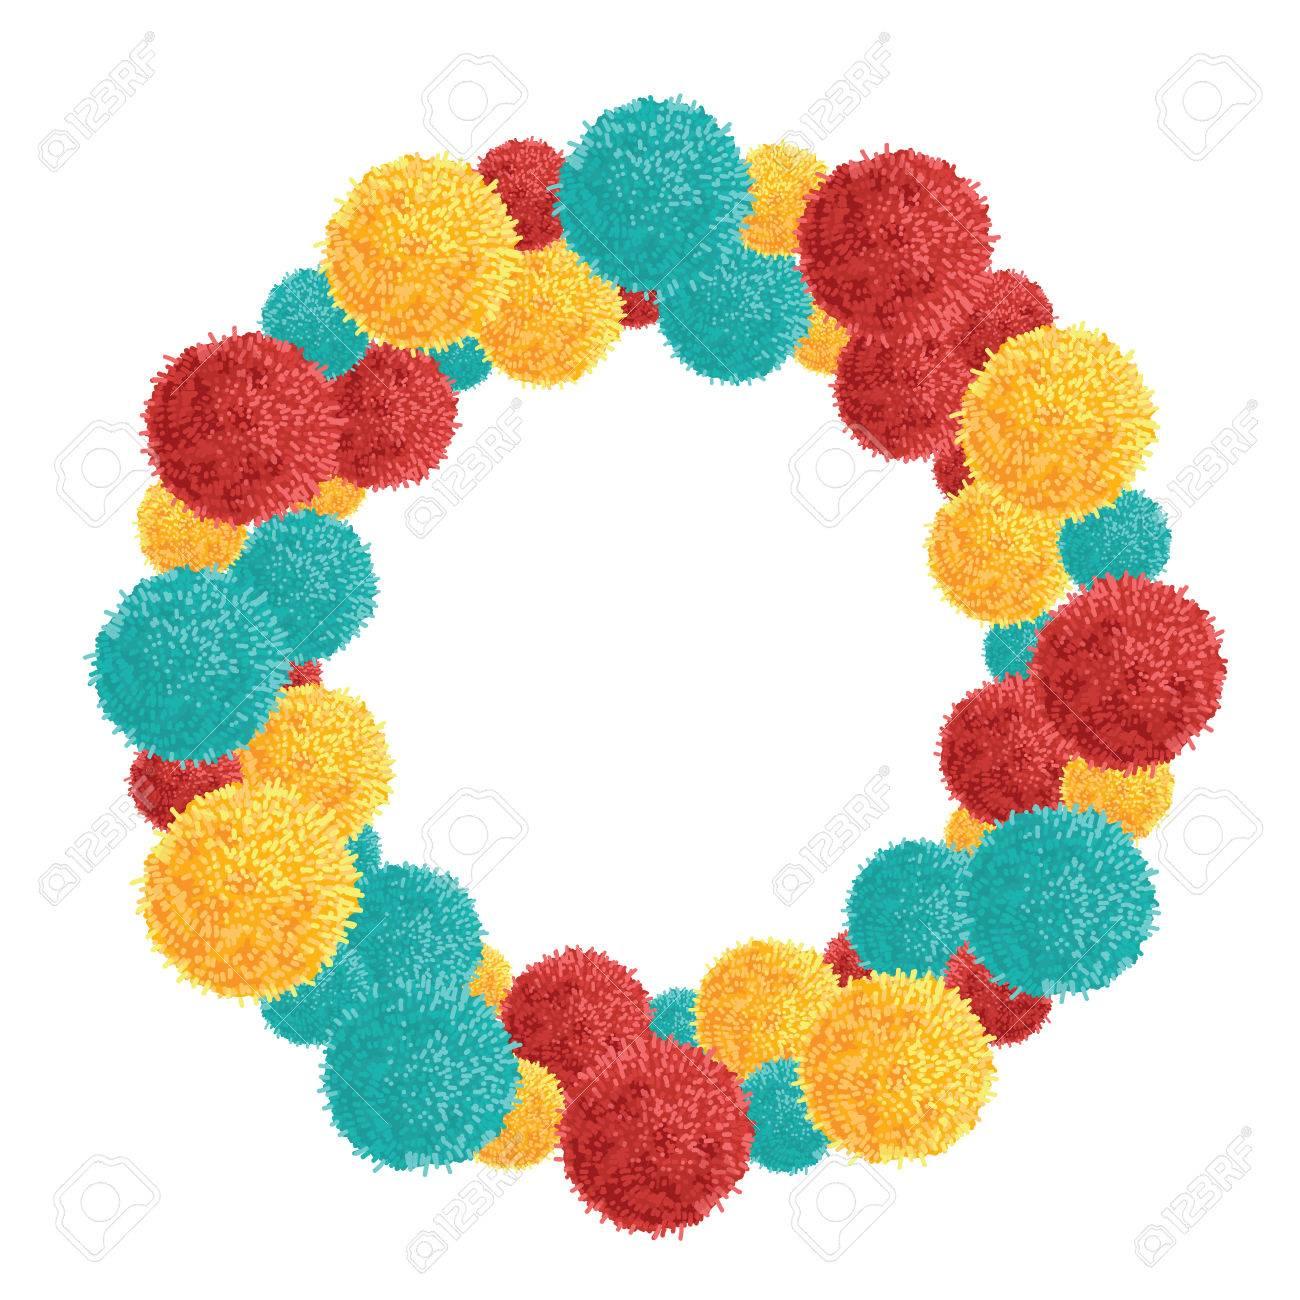 Vector Big Chunky Wreath Con Vibrante Colorido Cumpleaños Pom Poms ...